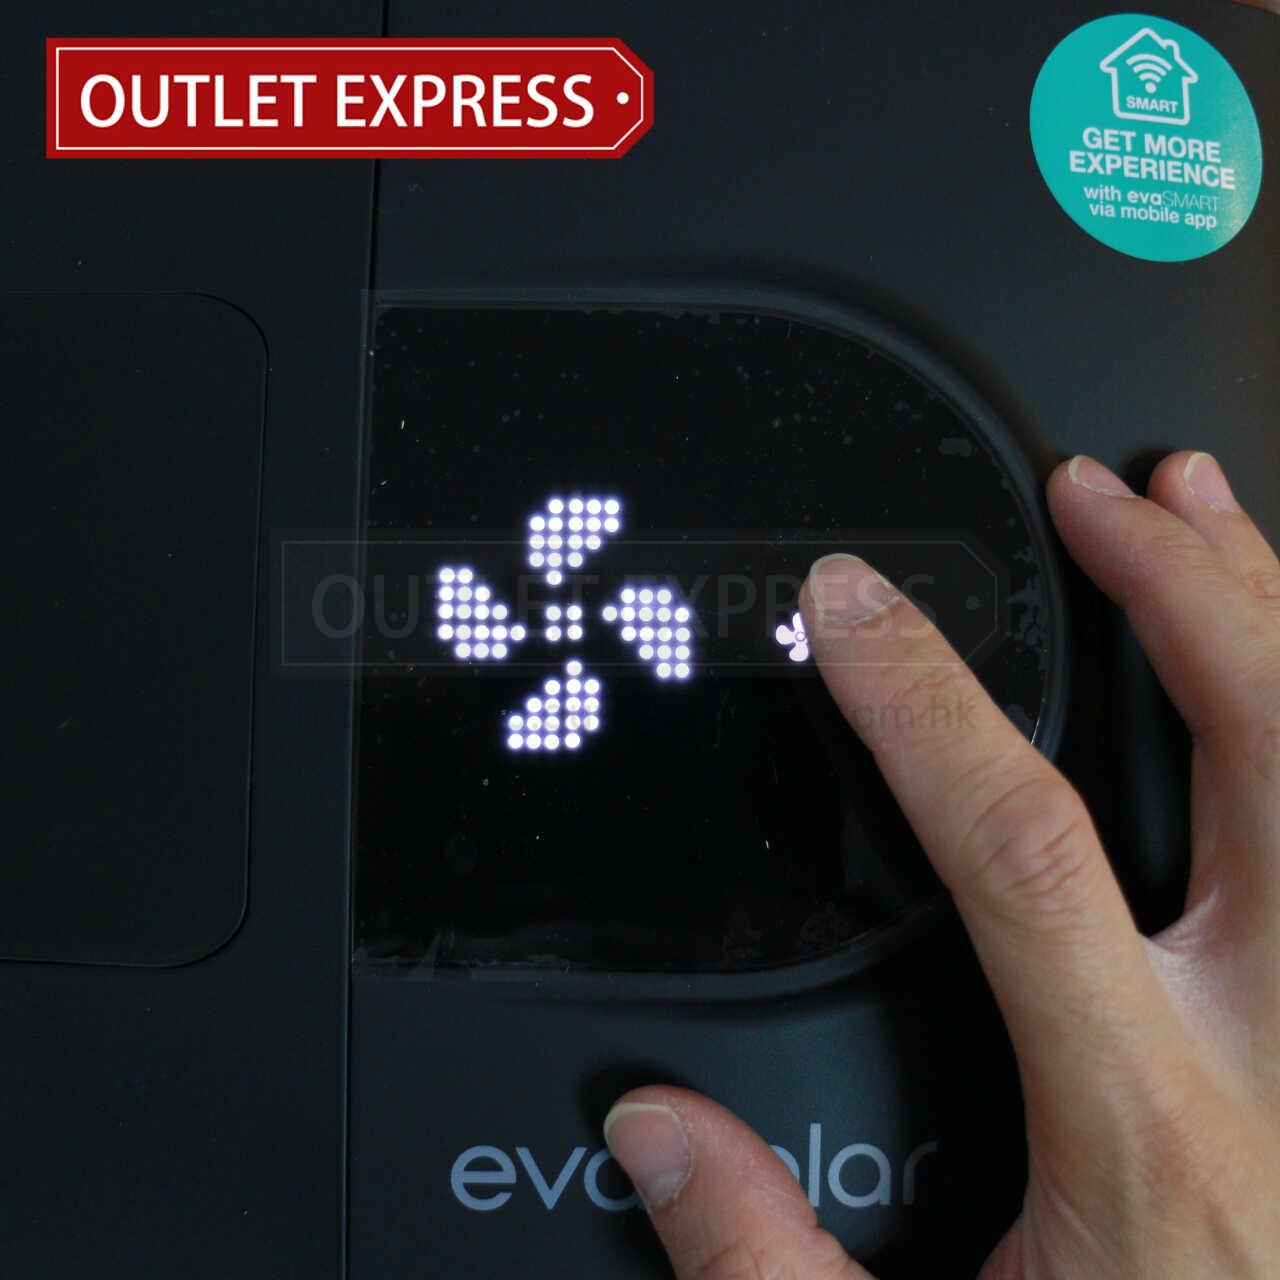 Evapolar 二代小型個人流動冷氣機 (evaSMART EV-3000) | 智能水冷風機 ( 現貨發售 ) | 香港行貨 風速- Outlet Express HK生活百貨城實拍相片